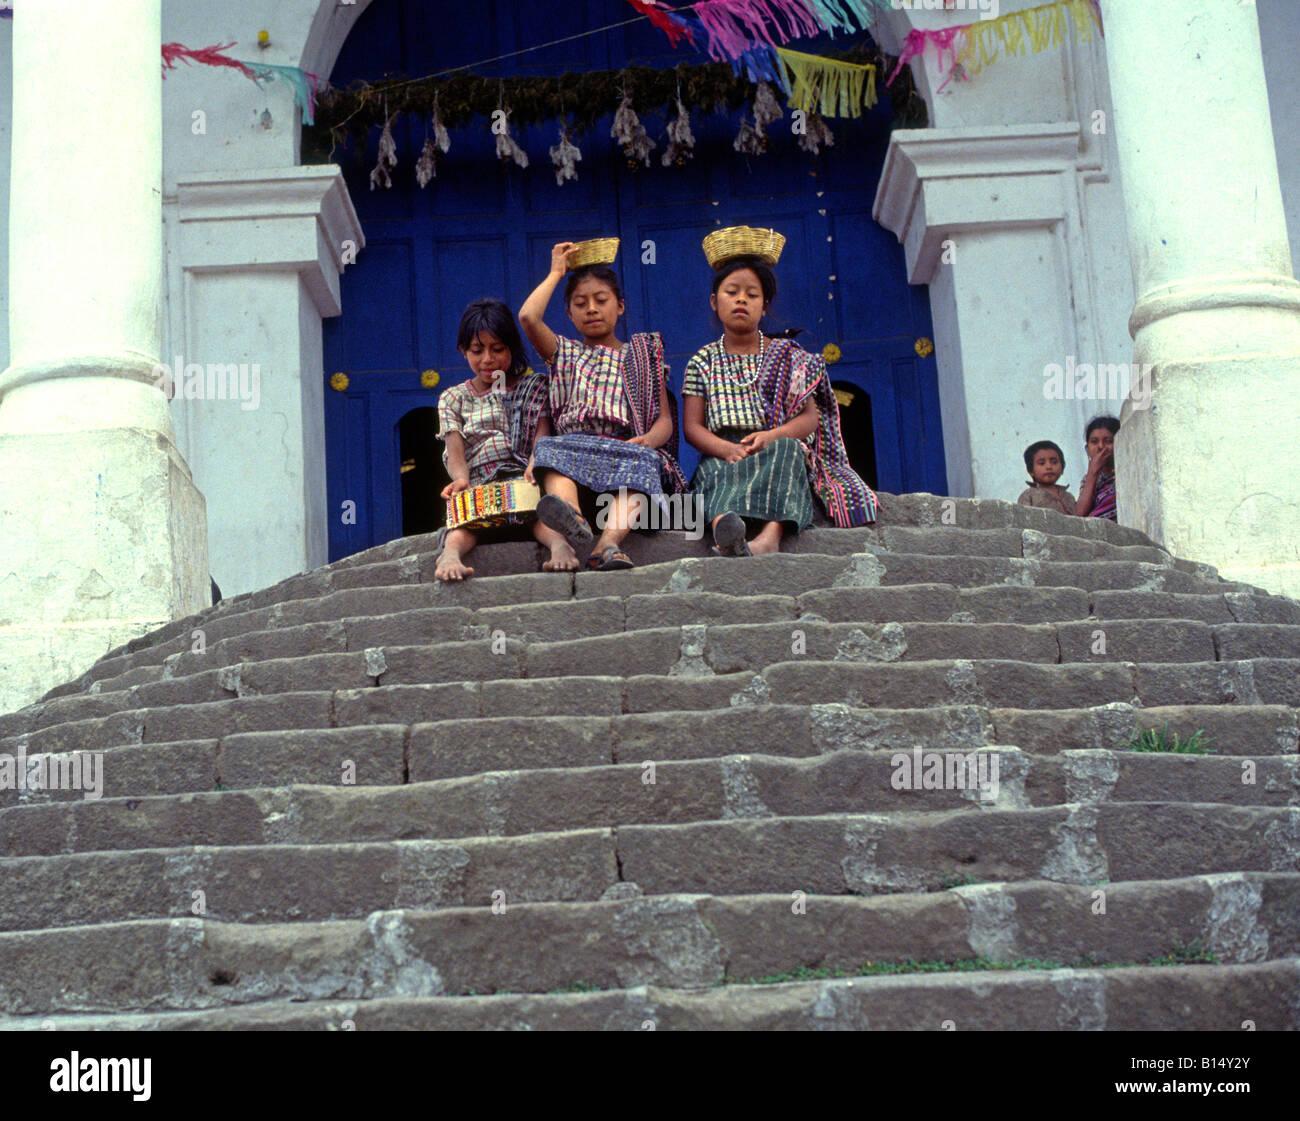 Mayan children sitting on church steps Santiago Atitlan, Guatemala - Stock Image